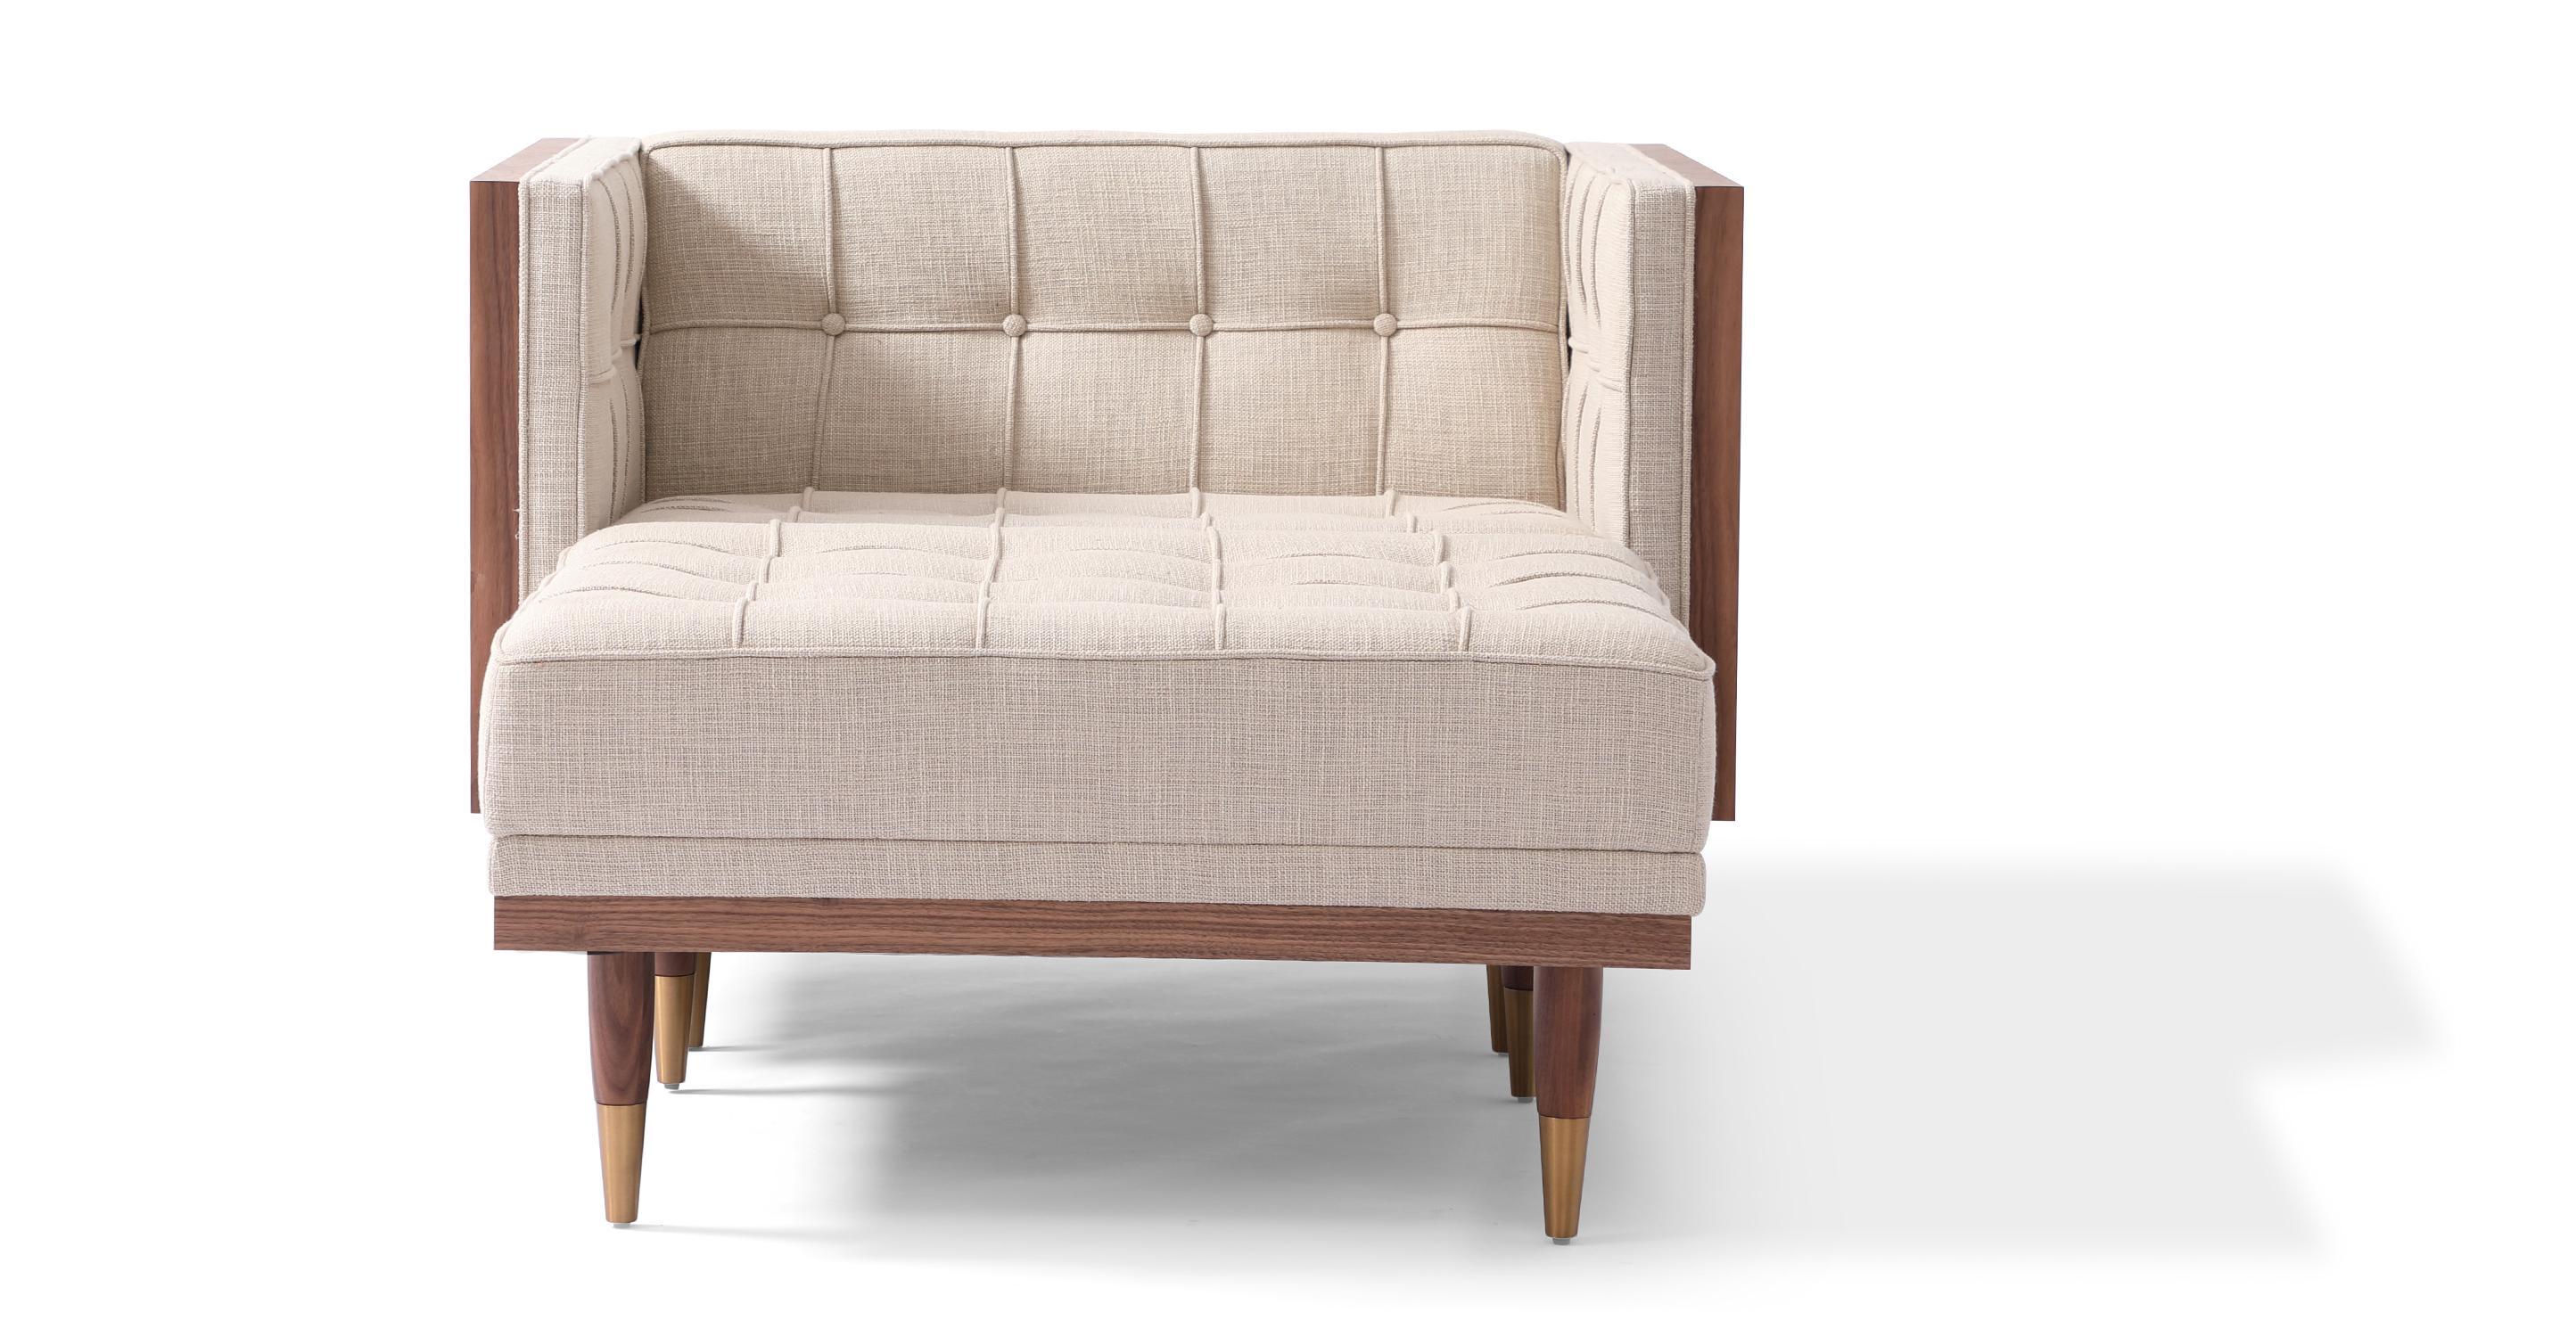 Woodrow Box Fabric Chair & Ottoman, Walnut/Urban Hemp